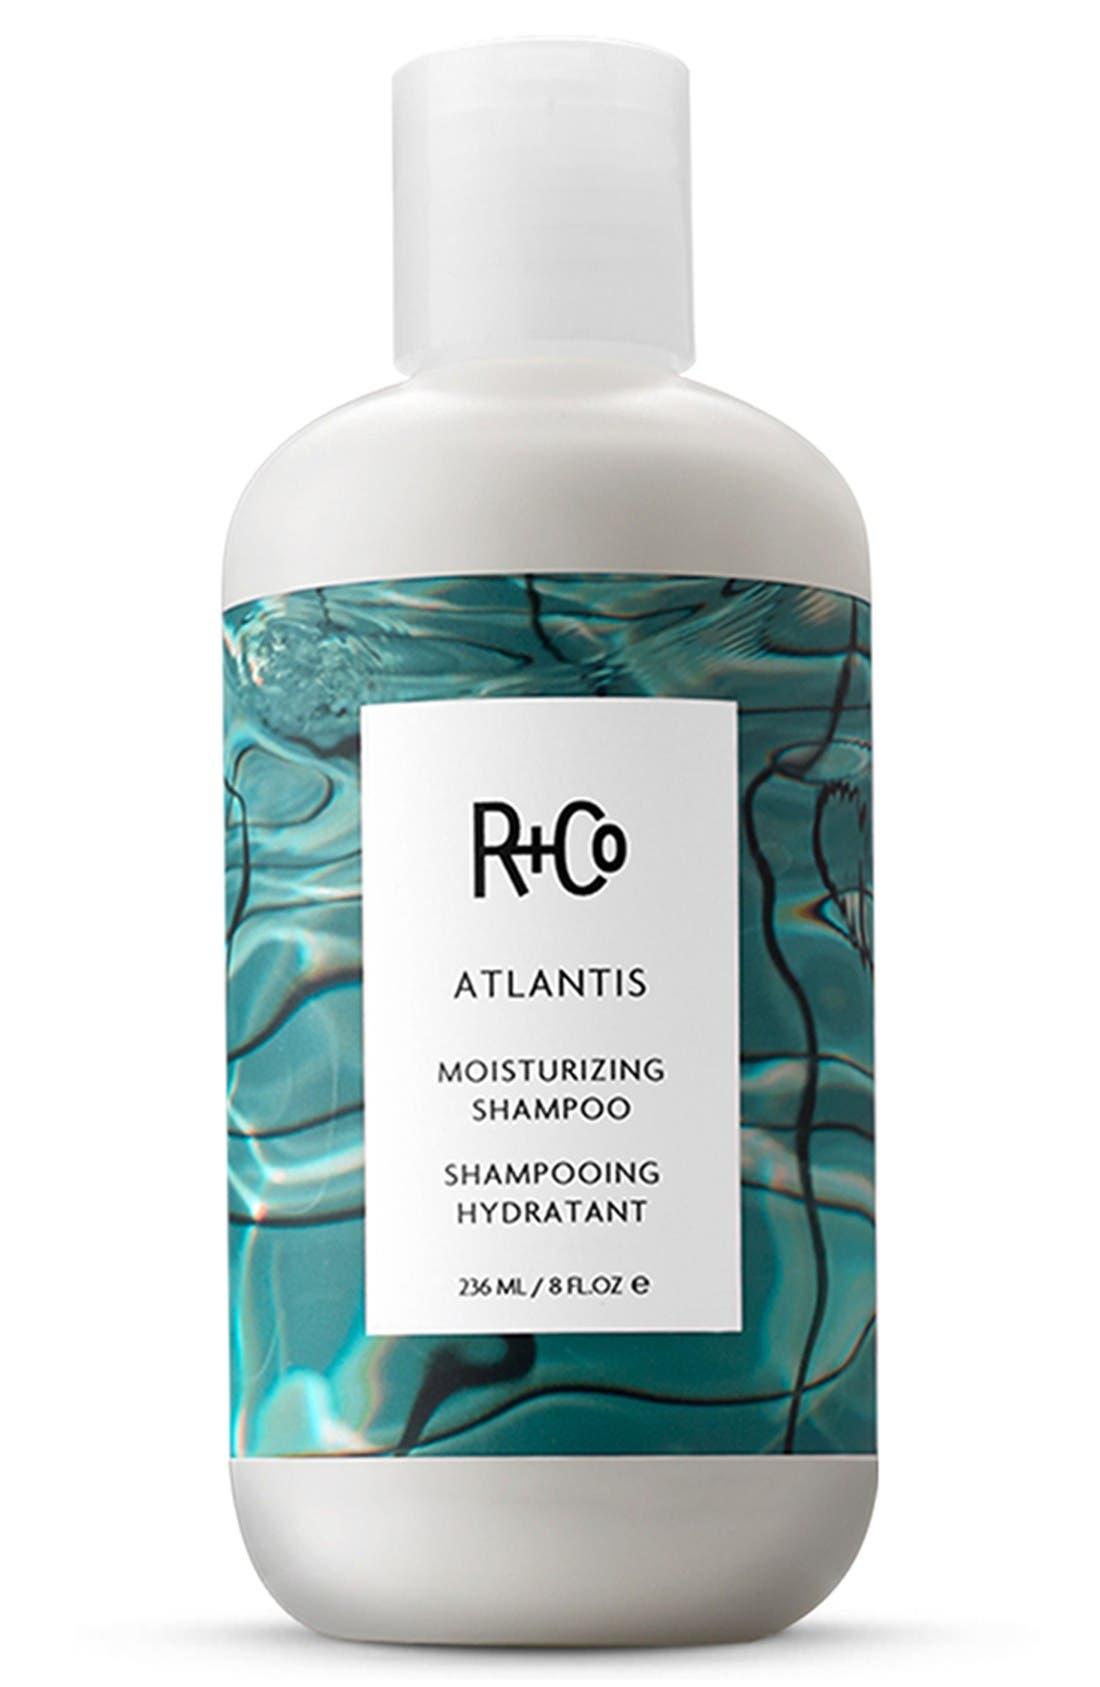 SPACE.NK.apothecary R+Co Atlantis Moisturizing Shampoo